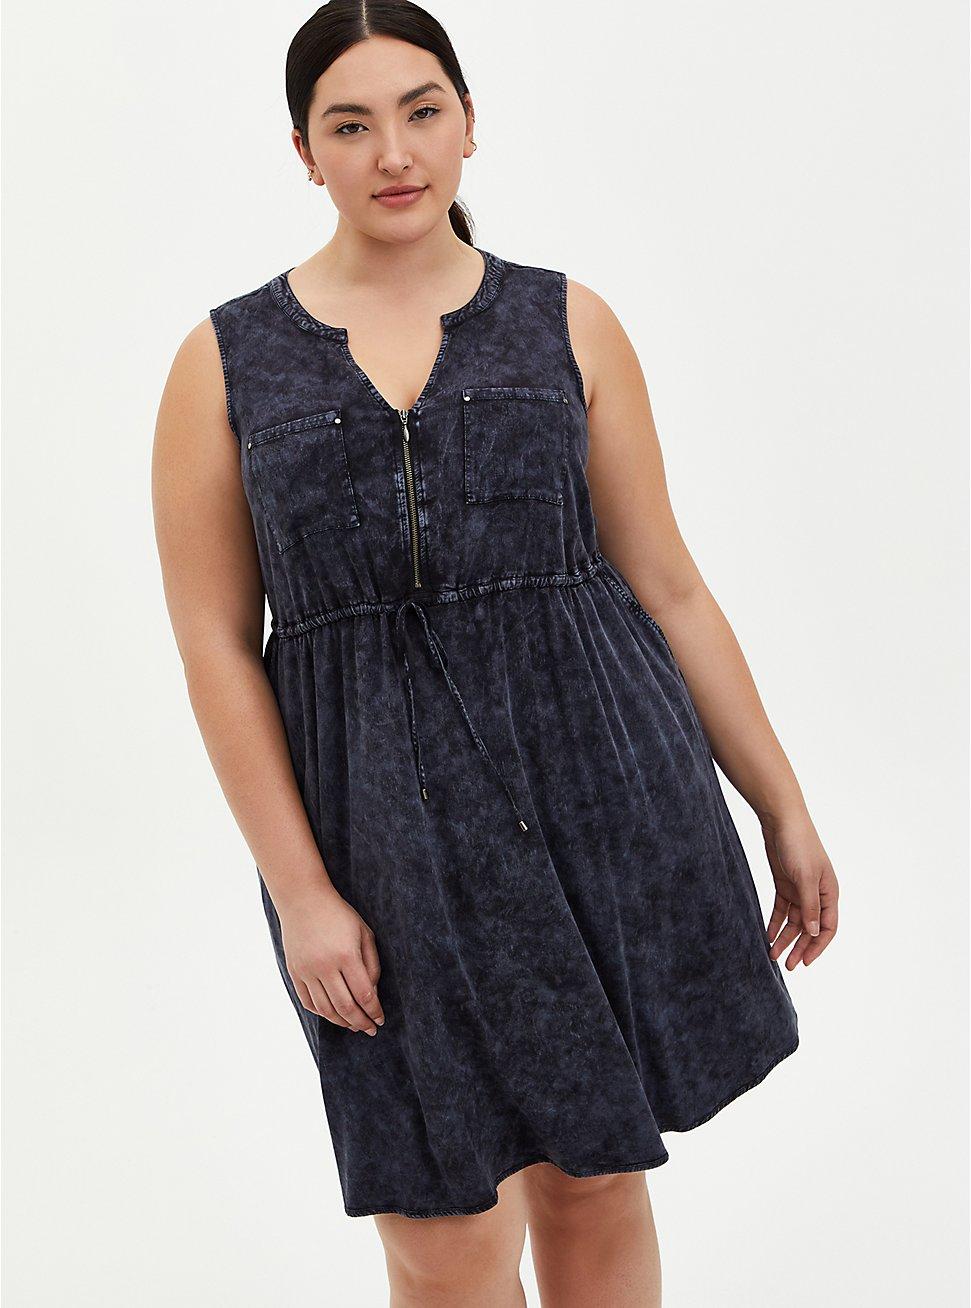 Black Wash Stretch Challis Zip Front Shirtdress, BLACK TIE DYE, hi-res